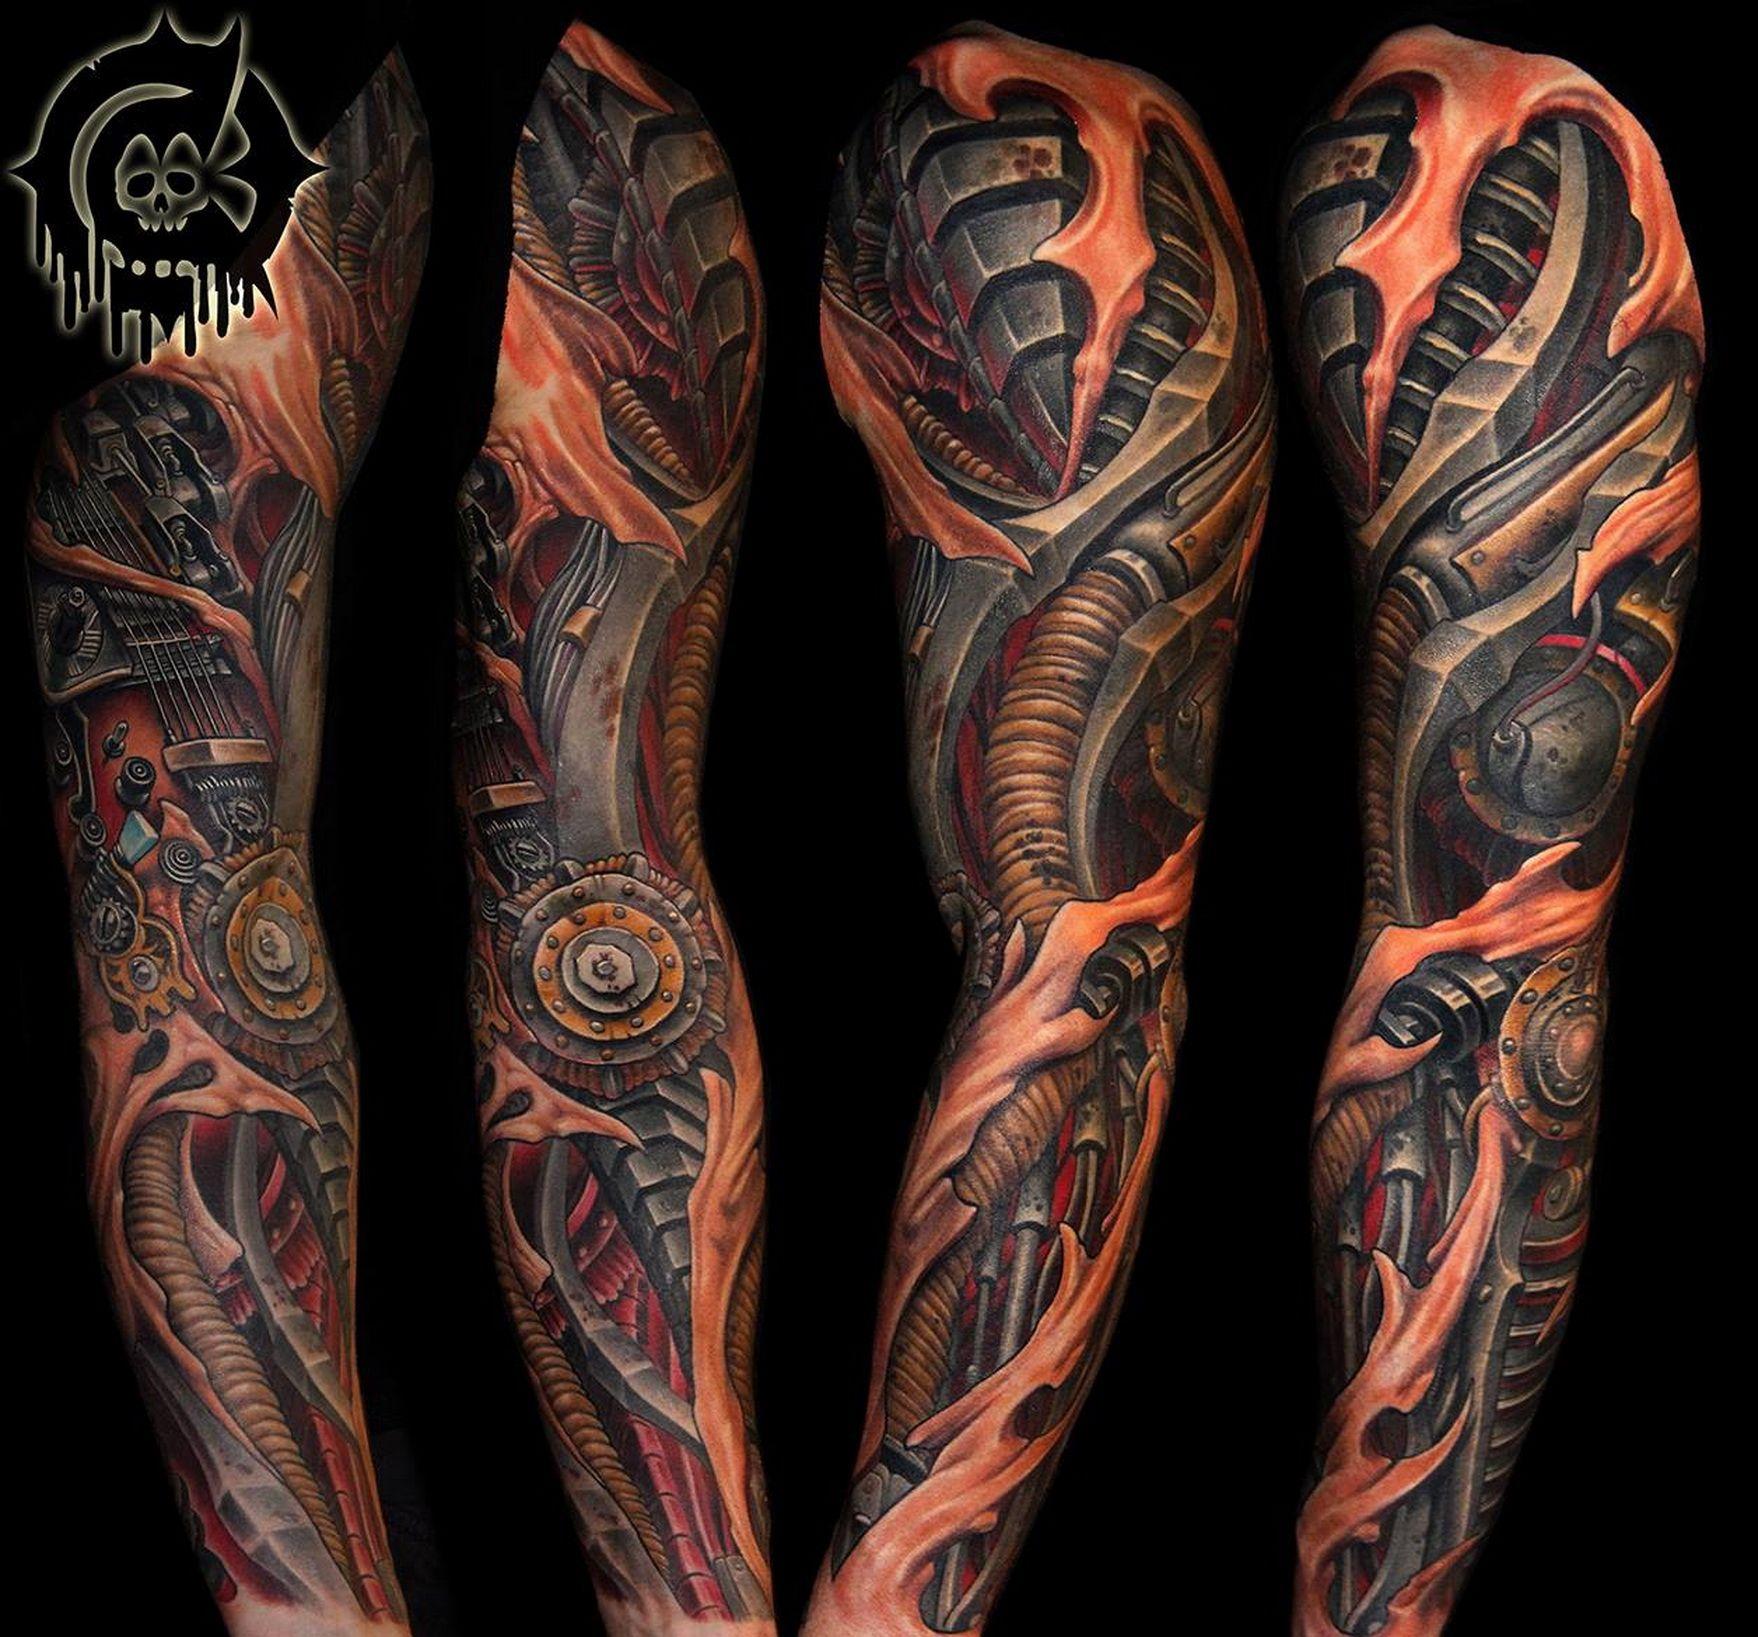 267786a10 Biomechanical Tattoo Sleeve Julian Siebert Biomechanical for proportions  1758 X 1637